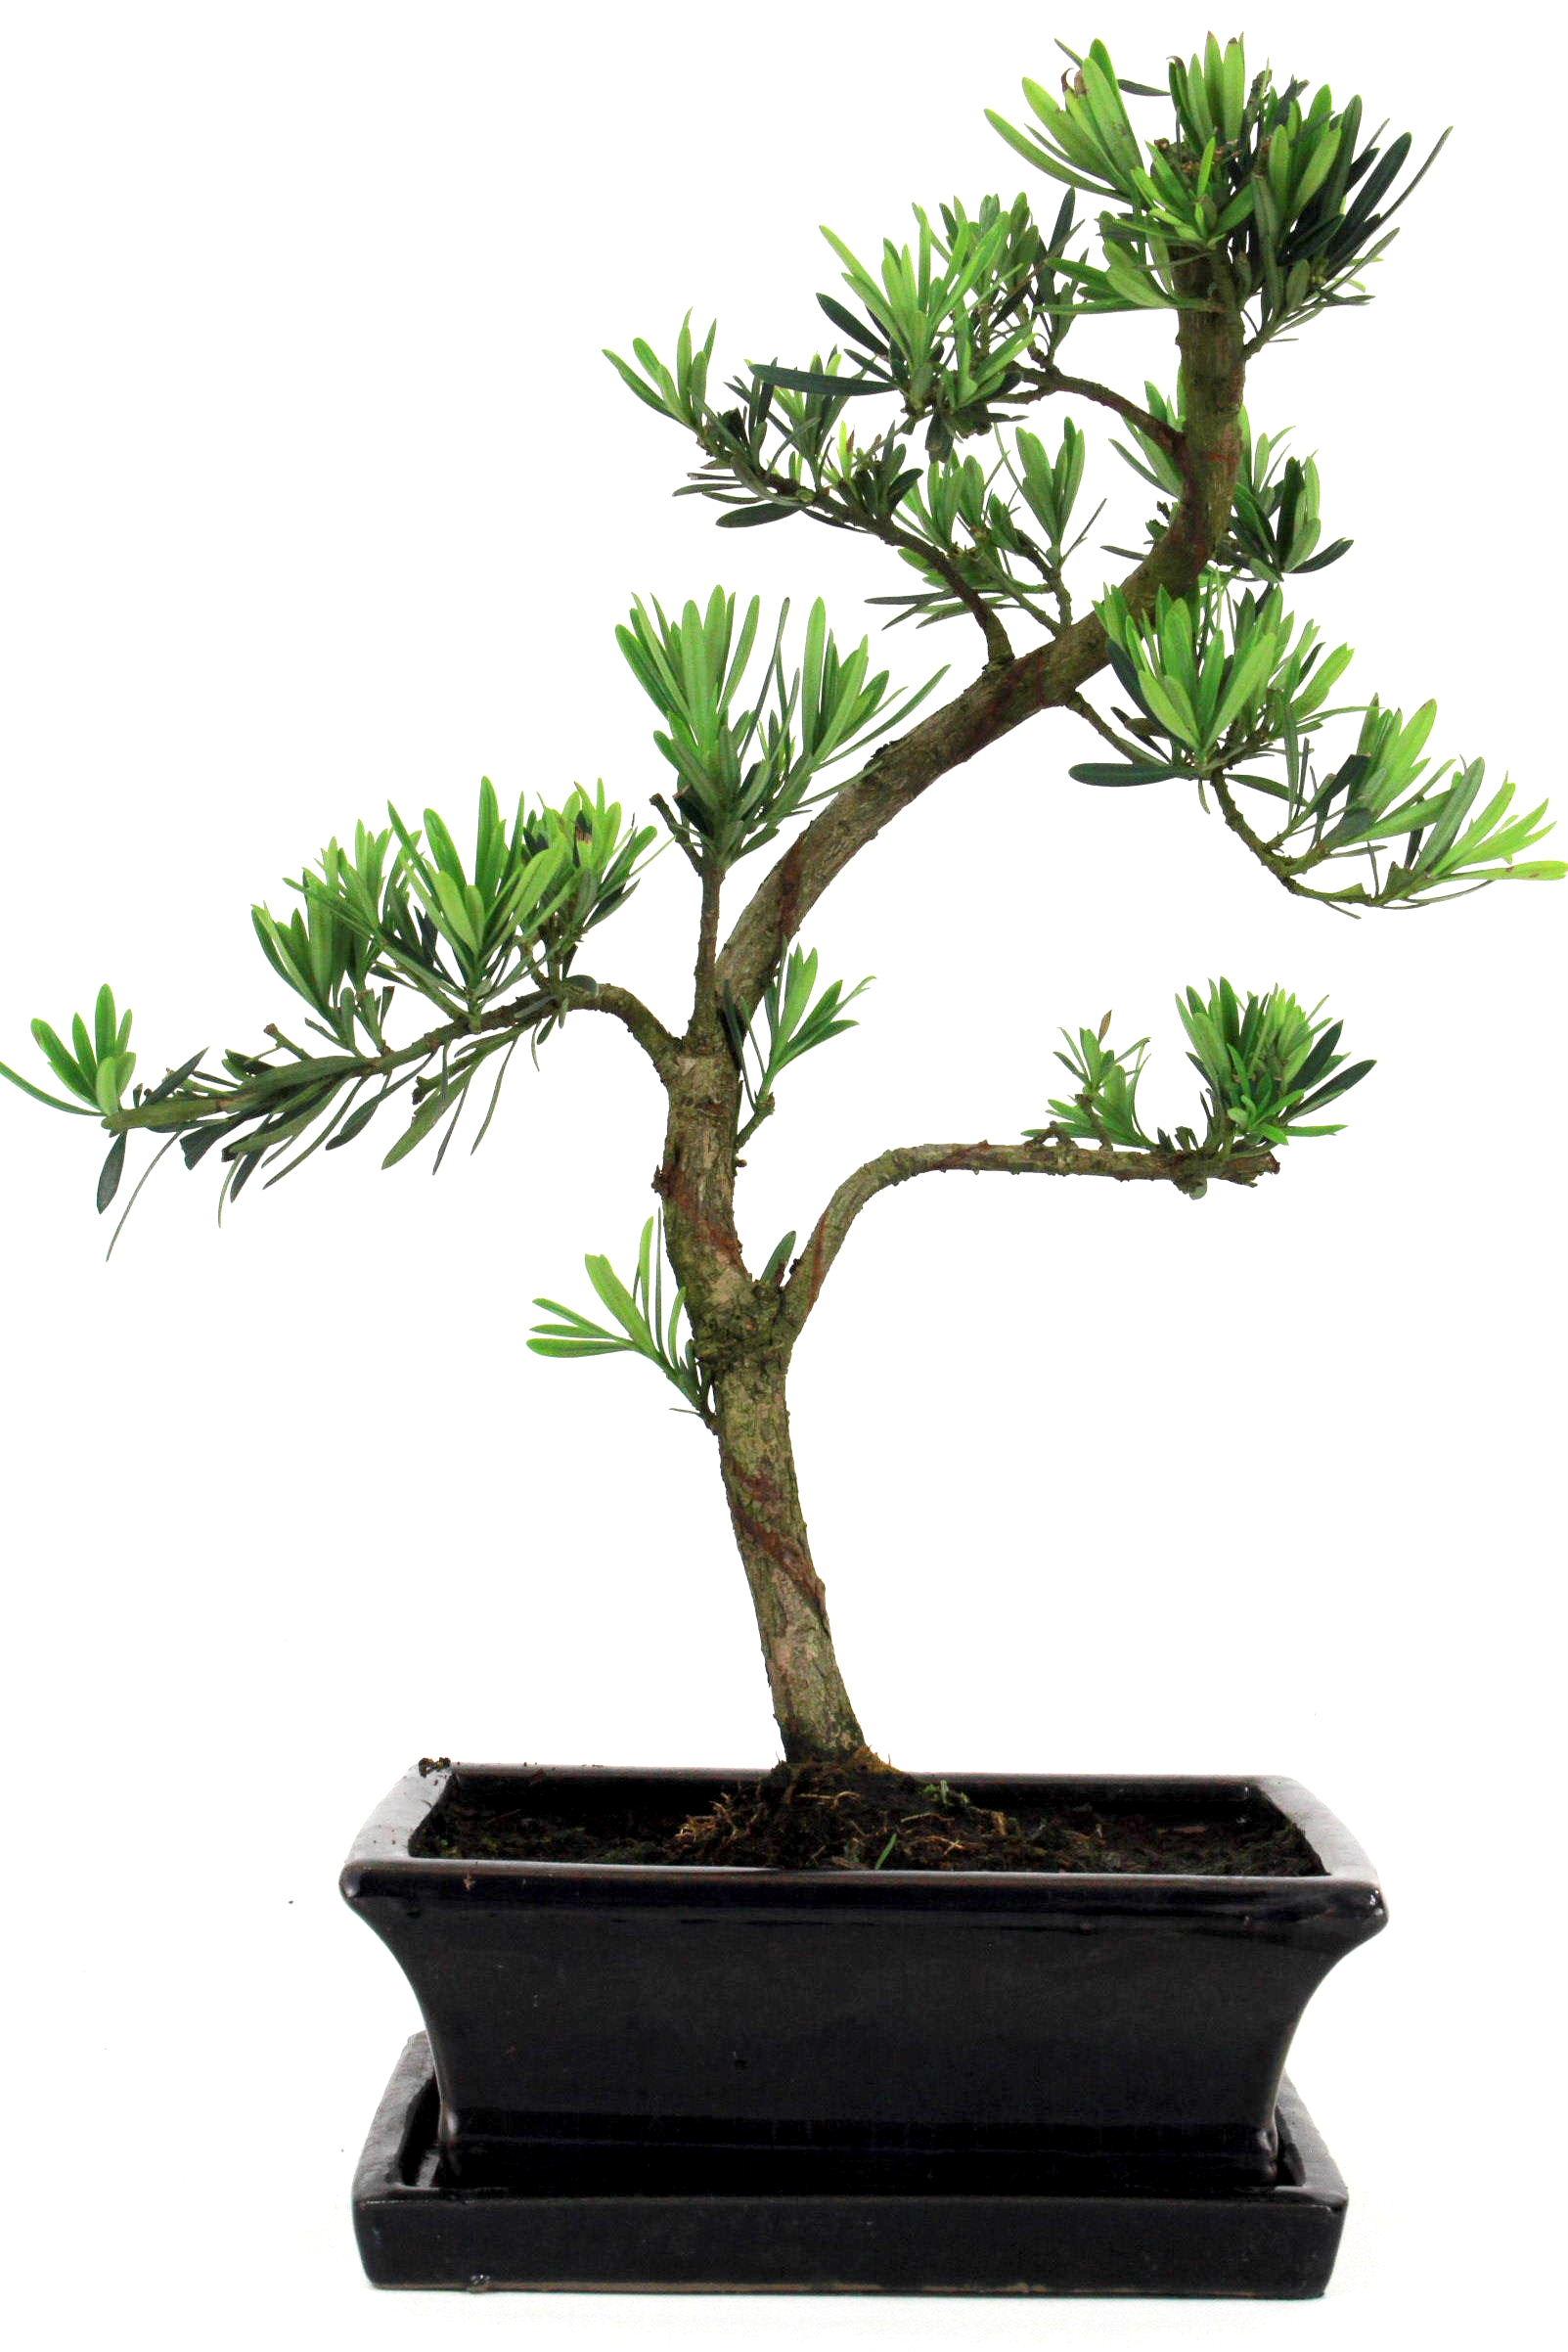 steineibe bonsai 35 40 cm 1917 bei oyaki bonsai kaufen. Black Bedroom Furniture Sets. Home Design Ideas